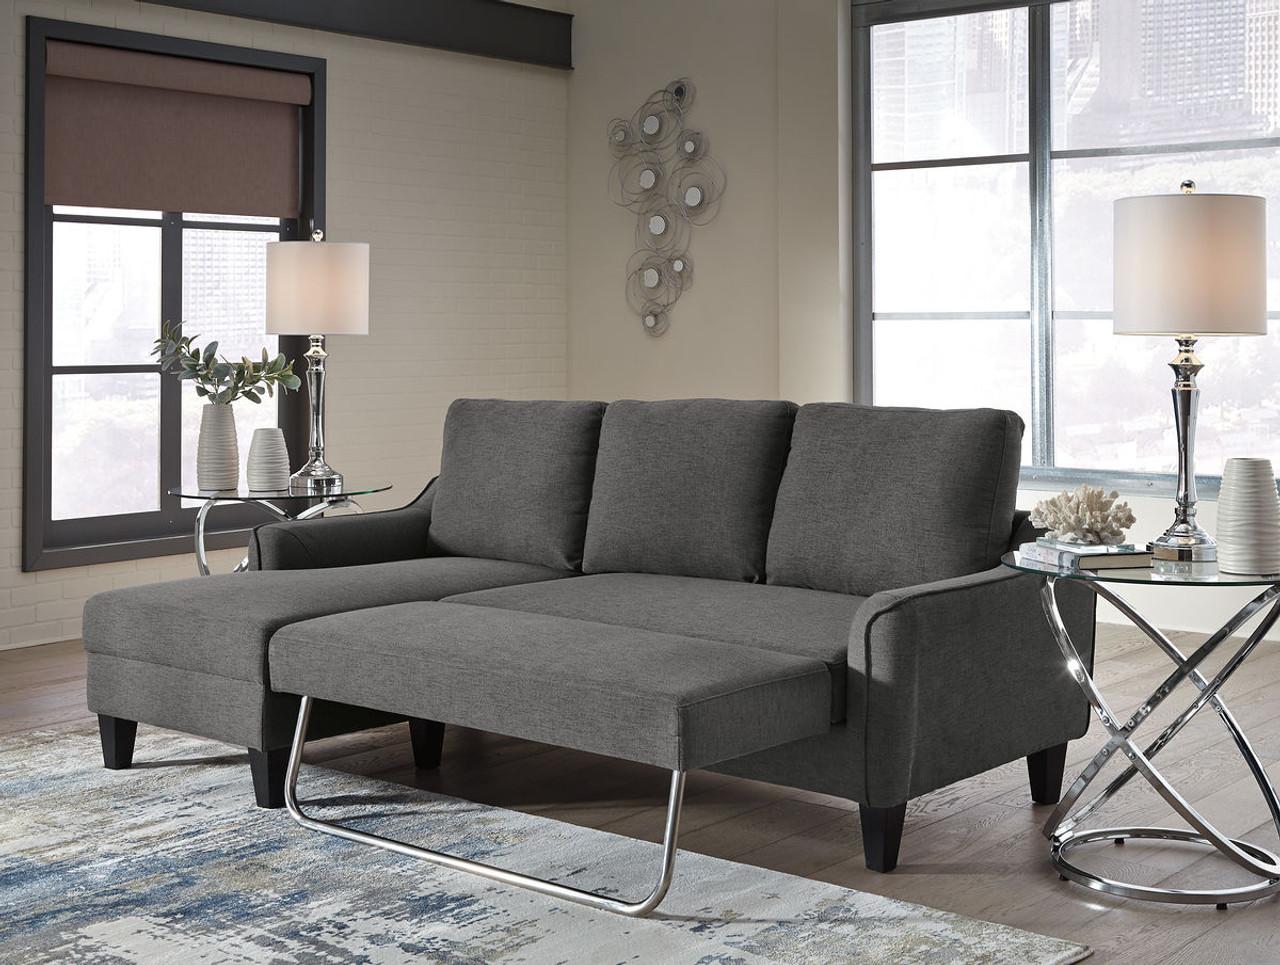 Tremendous Jarreau Gray Queen Sofa Sleeper Creativecarmelina Interior Chair Design Creativecarmelinacom